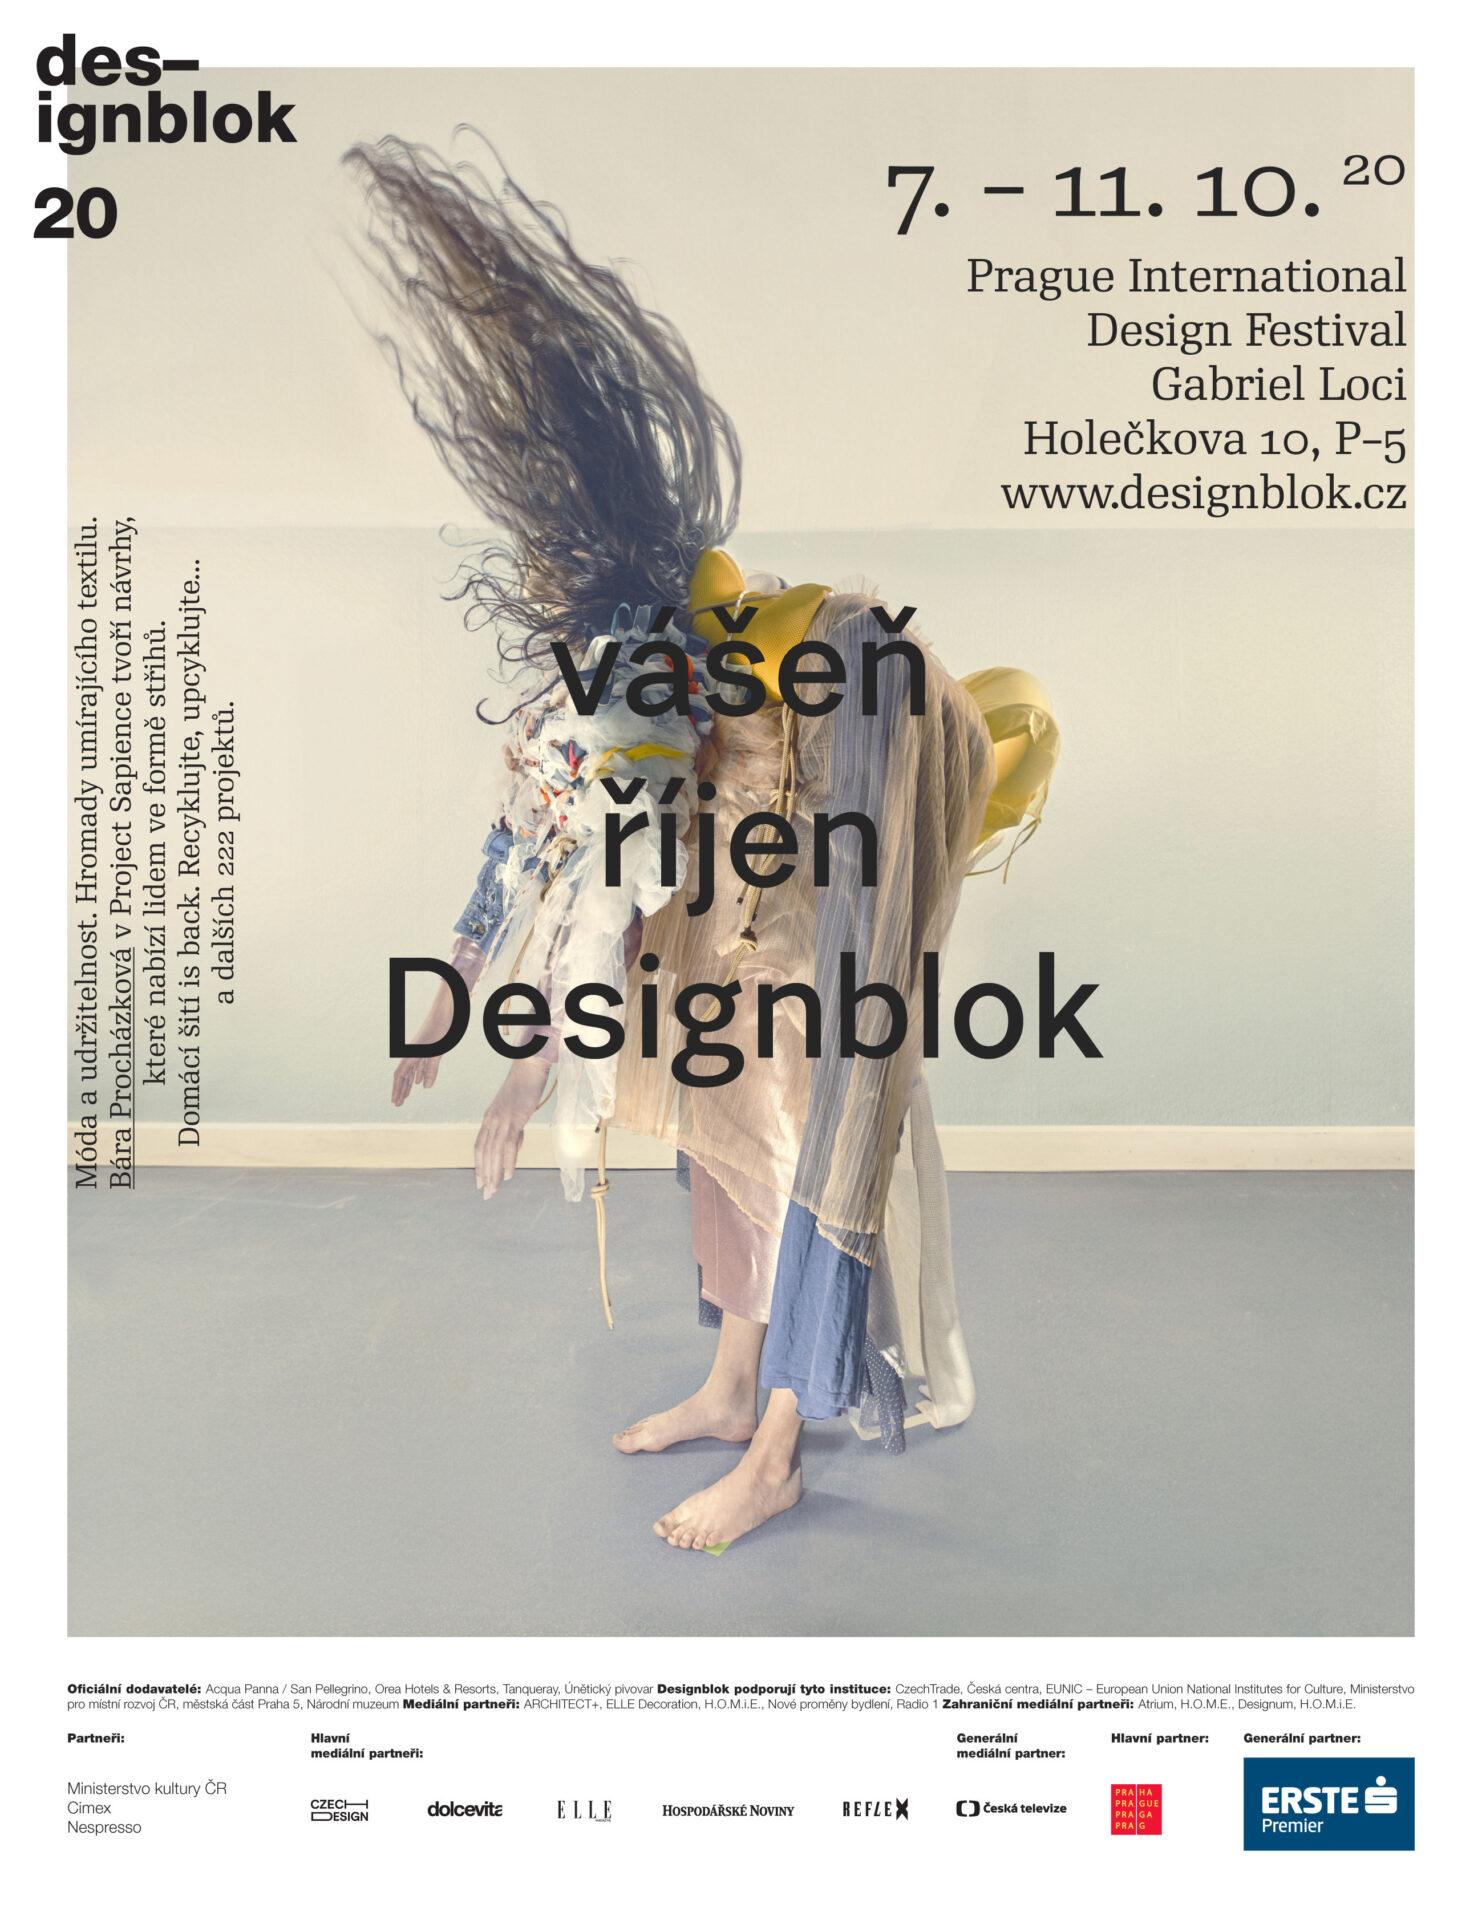 Designblok 2020 téma vášeň říjen